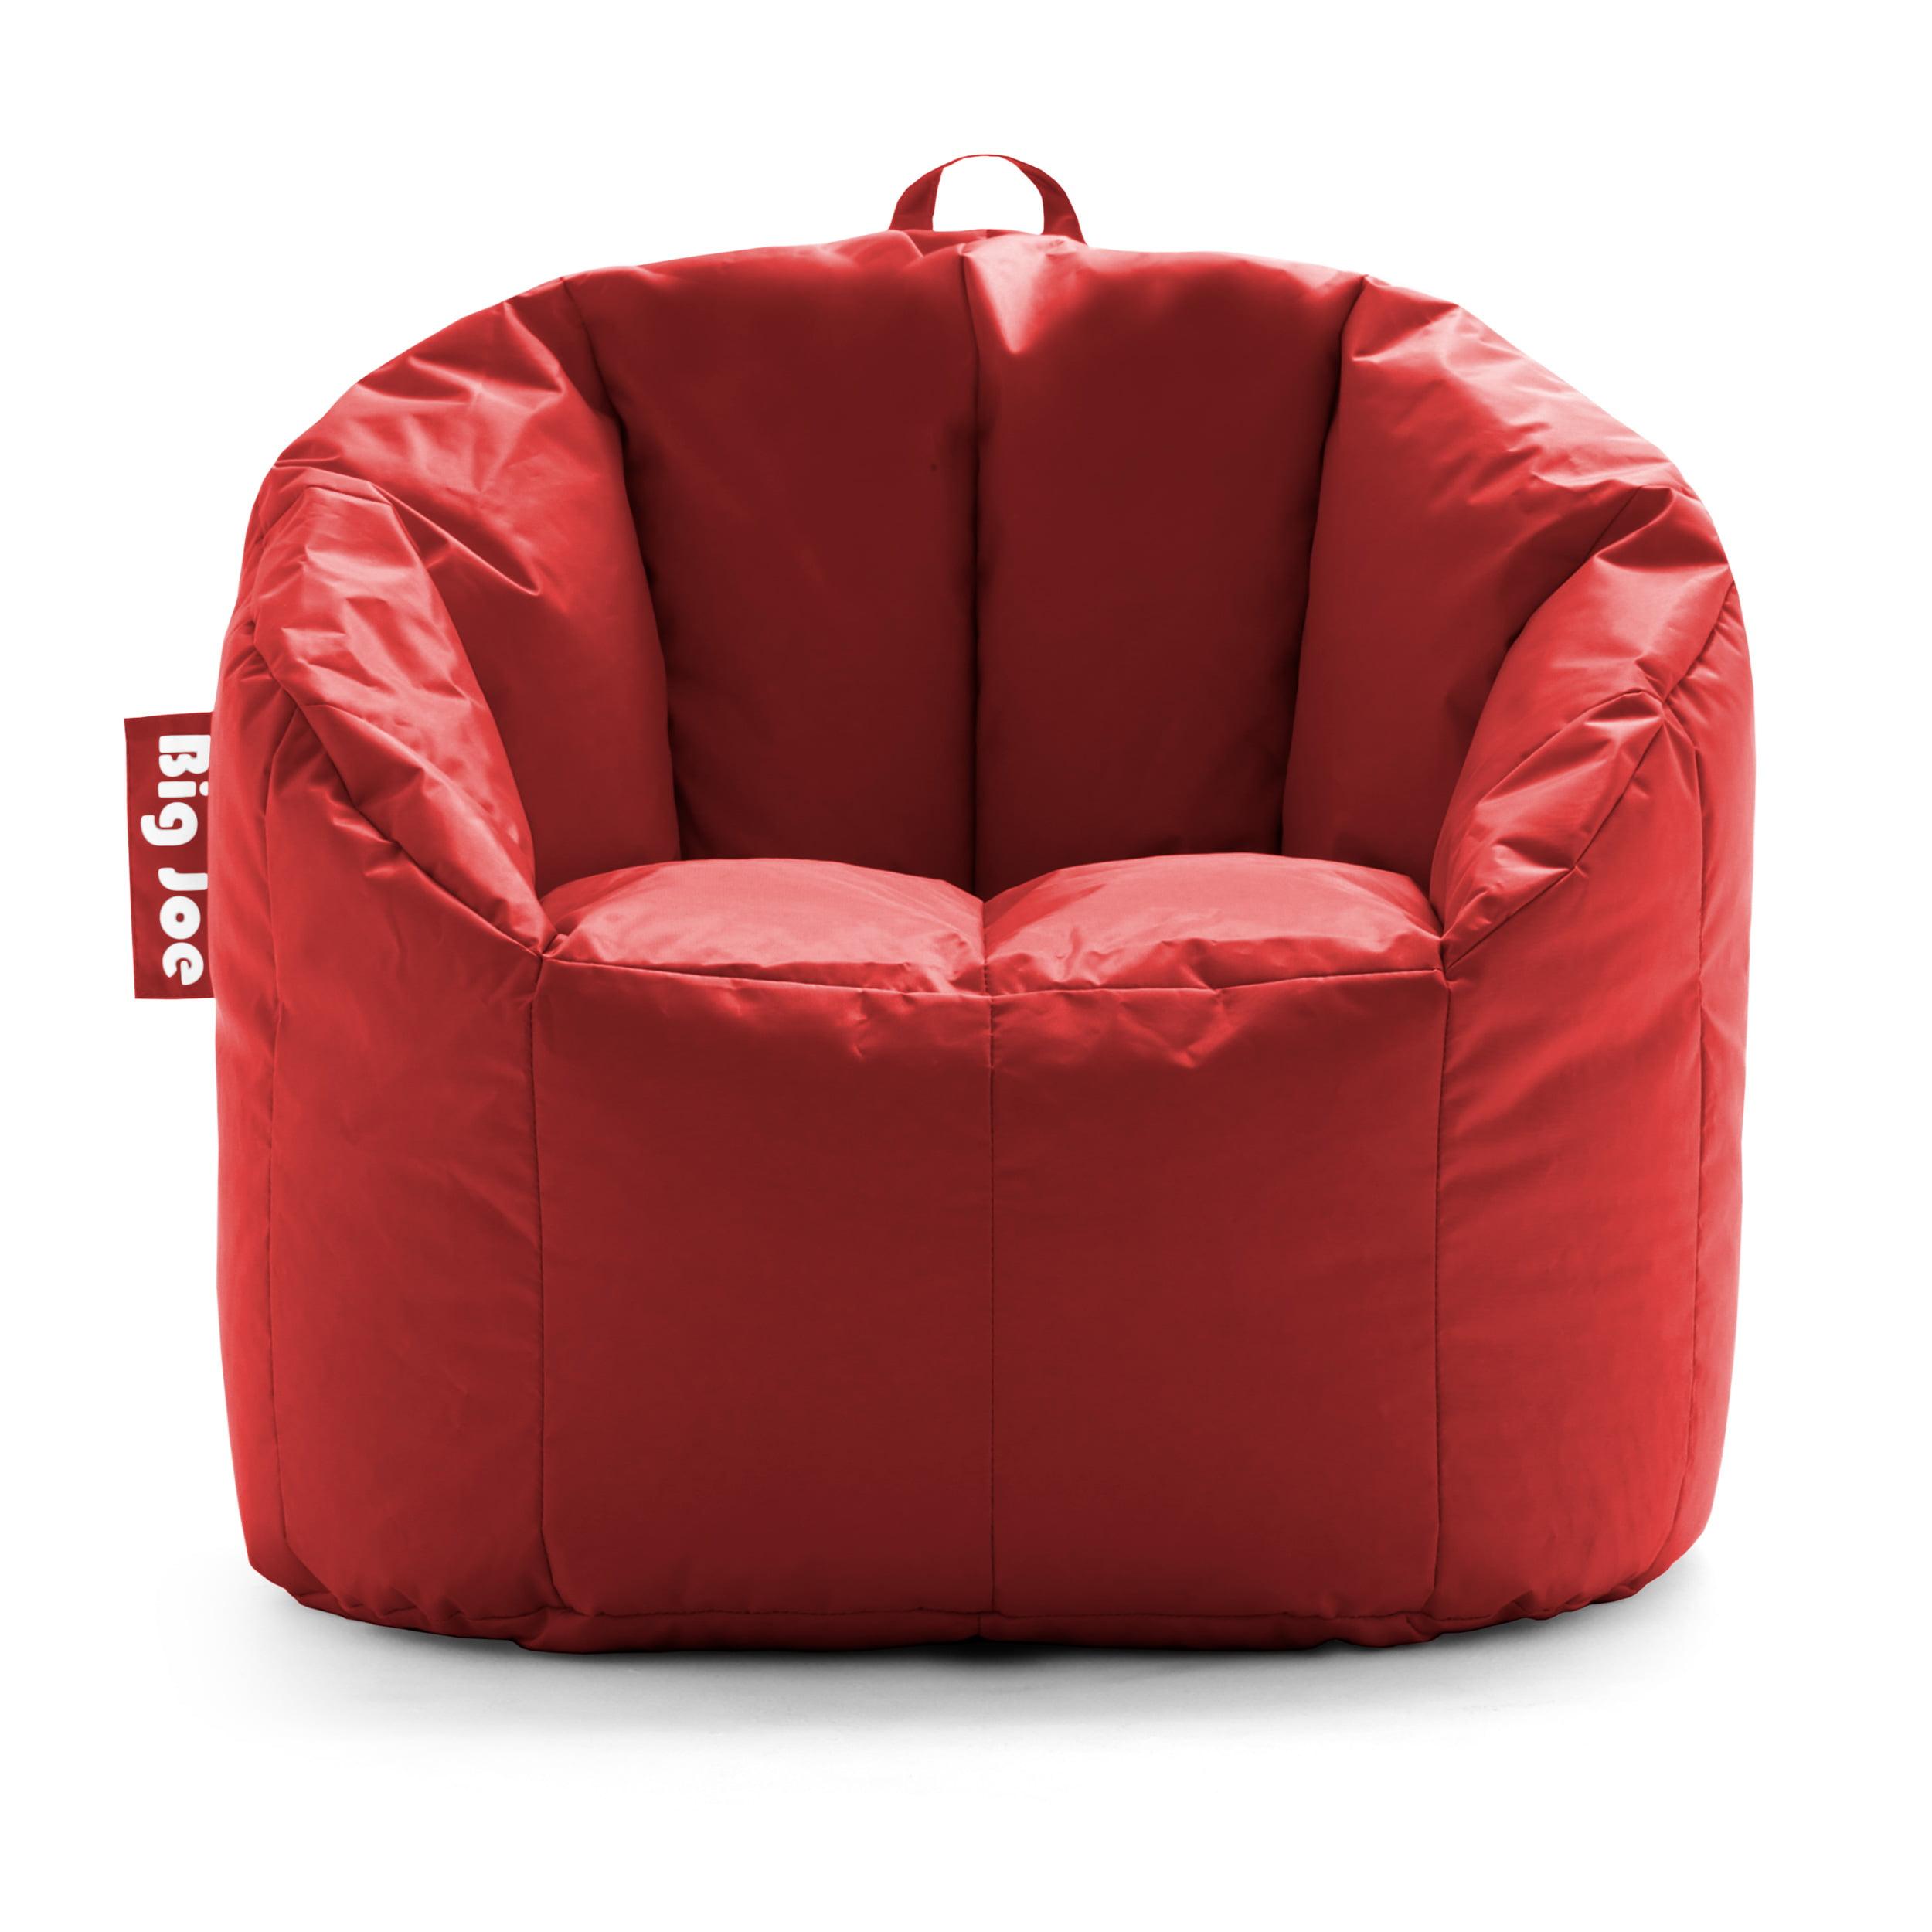 Pleasant Big Joe Milano Bean Bag Chair Multiple Colors 32 X 28 X Inzonedesignstudio Interior Chair Design Inzonedesignstudiocom